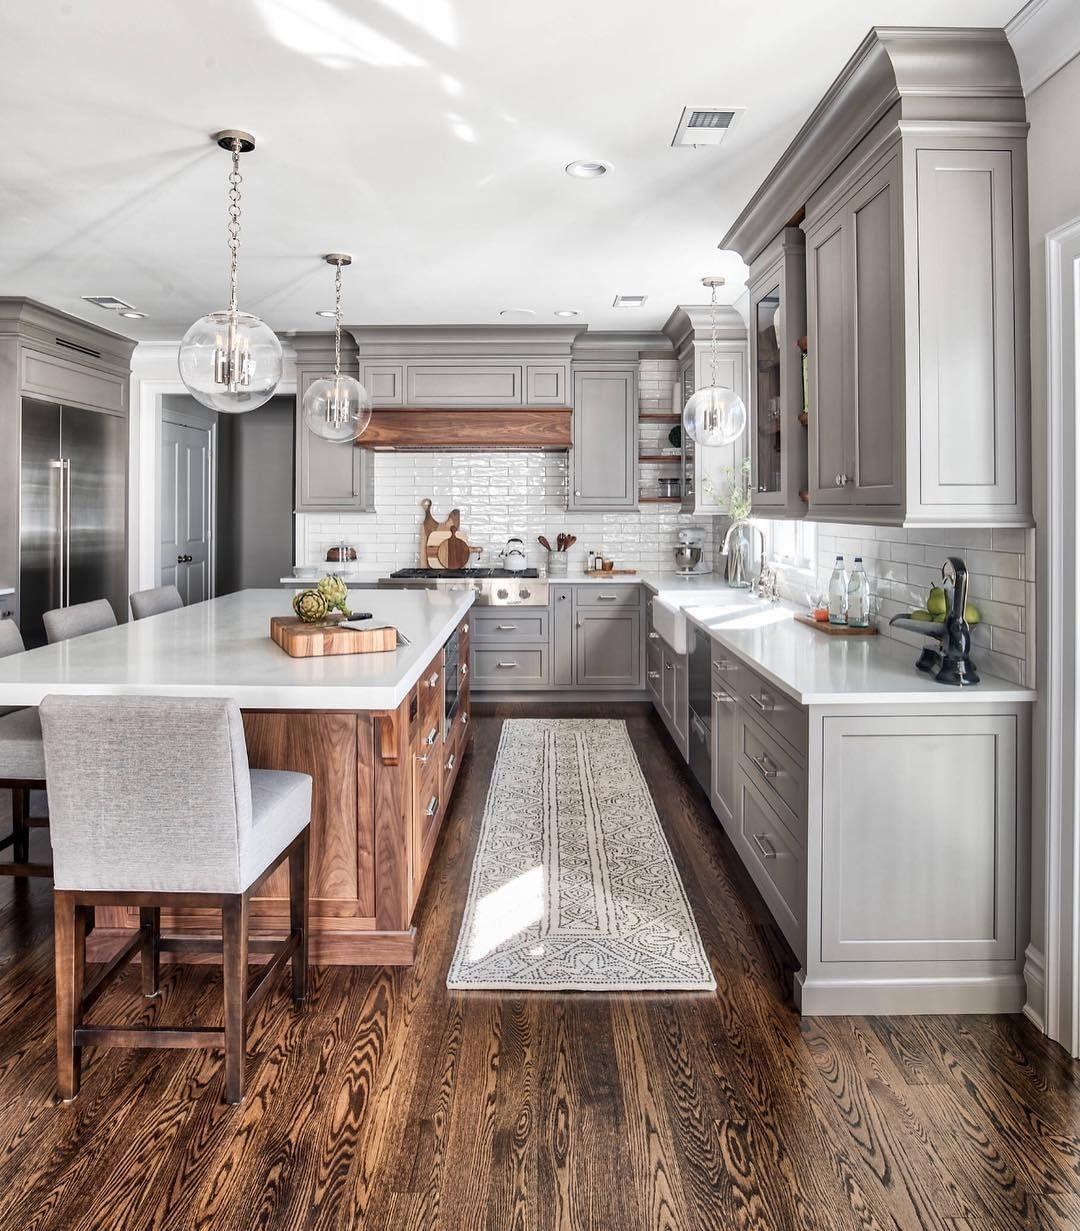 Stonington Gray Kitchen: We've Got One Word For This Gorgeous Kitche